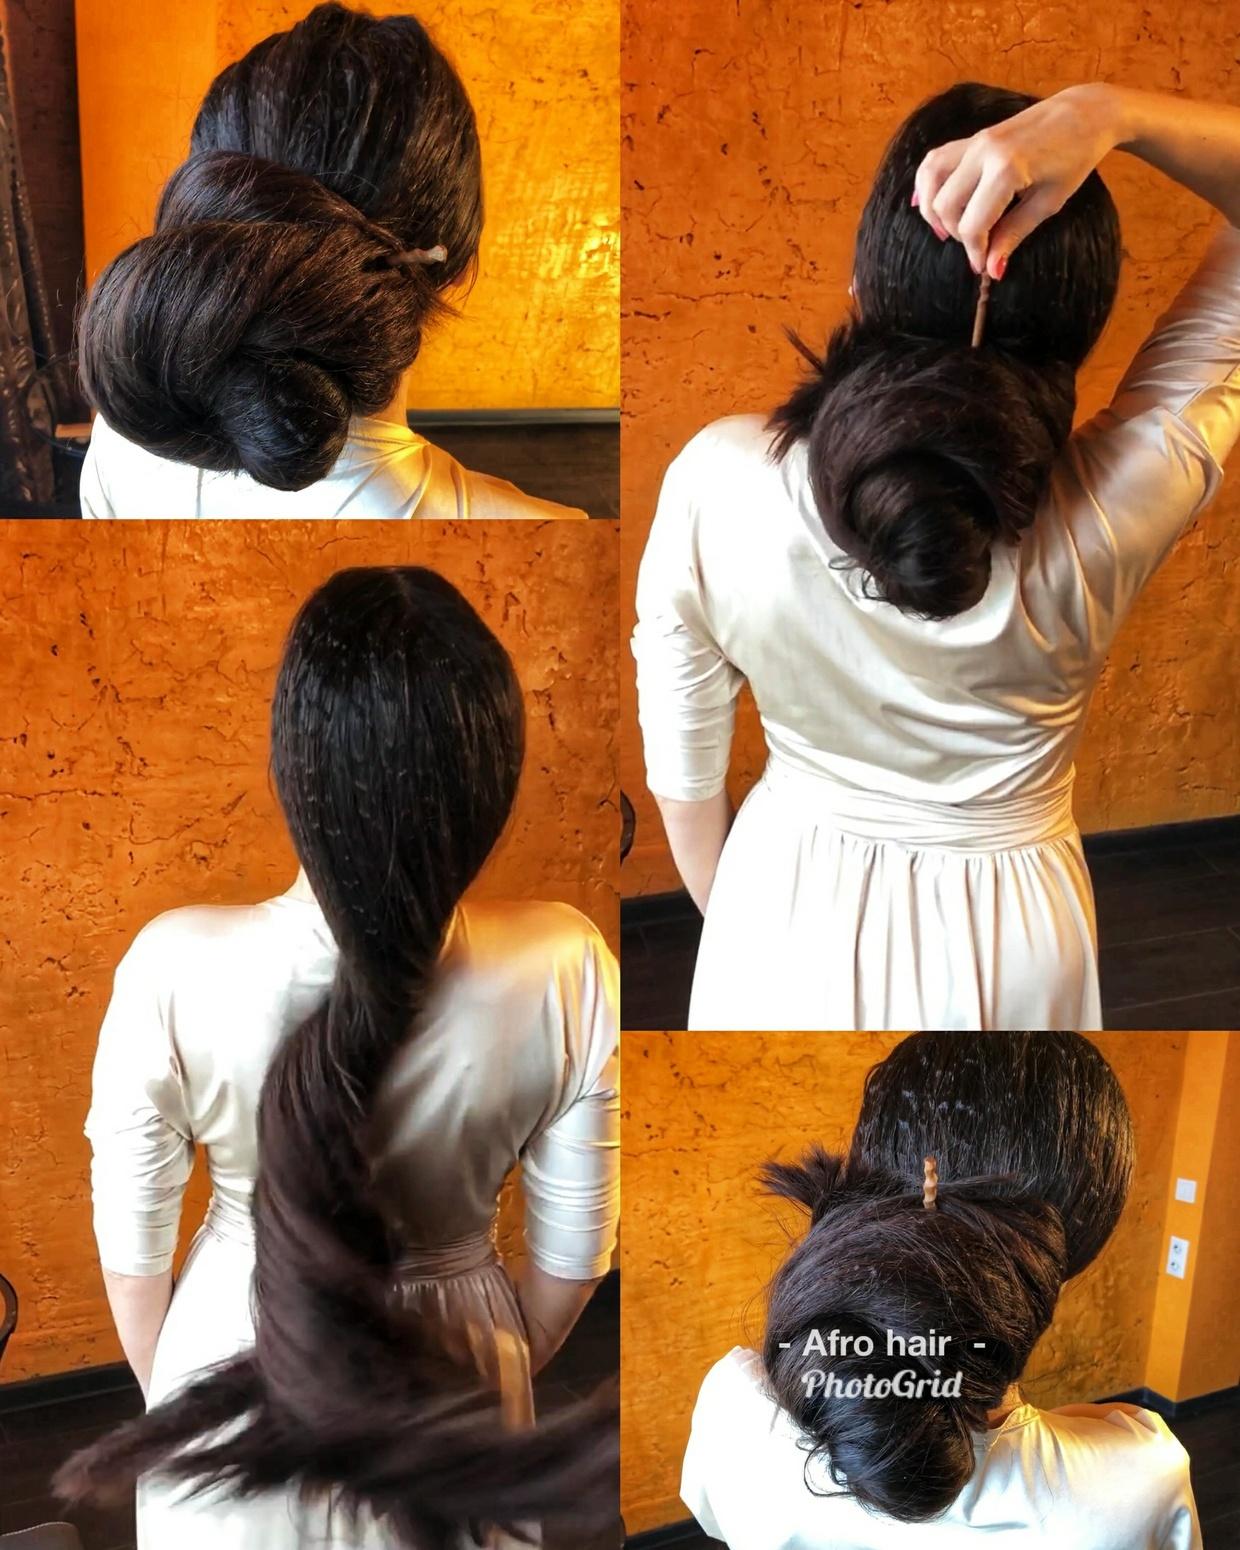 Afro hair, Big bun, bun drop, braid, ponytai, hair play - 20 minutes